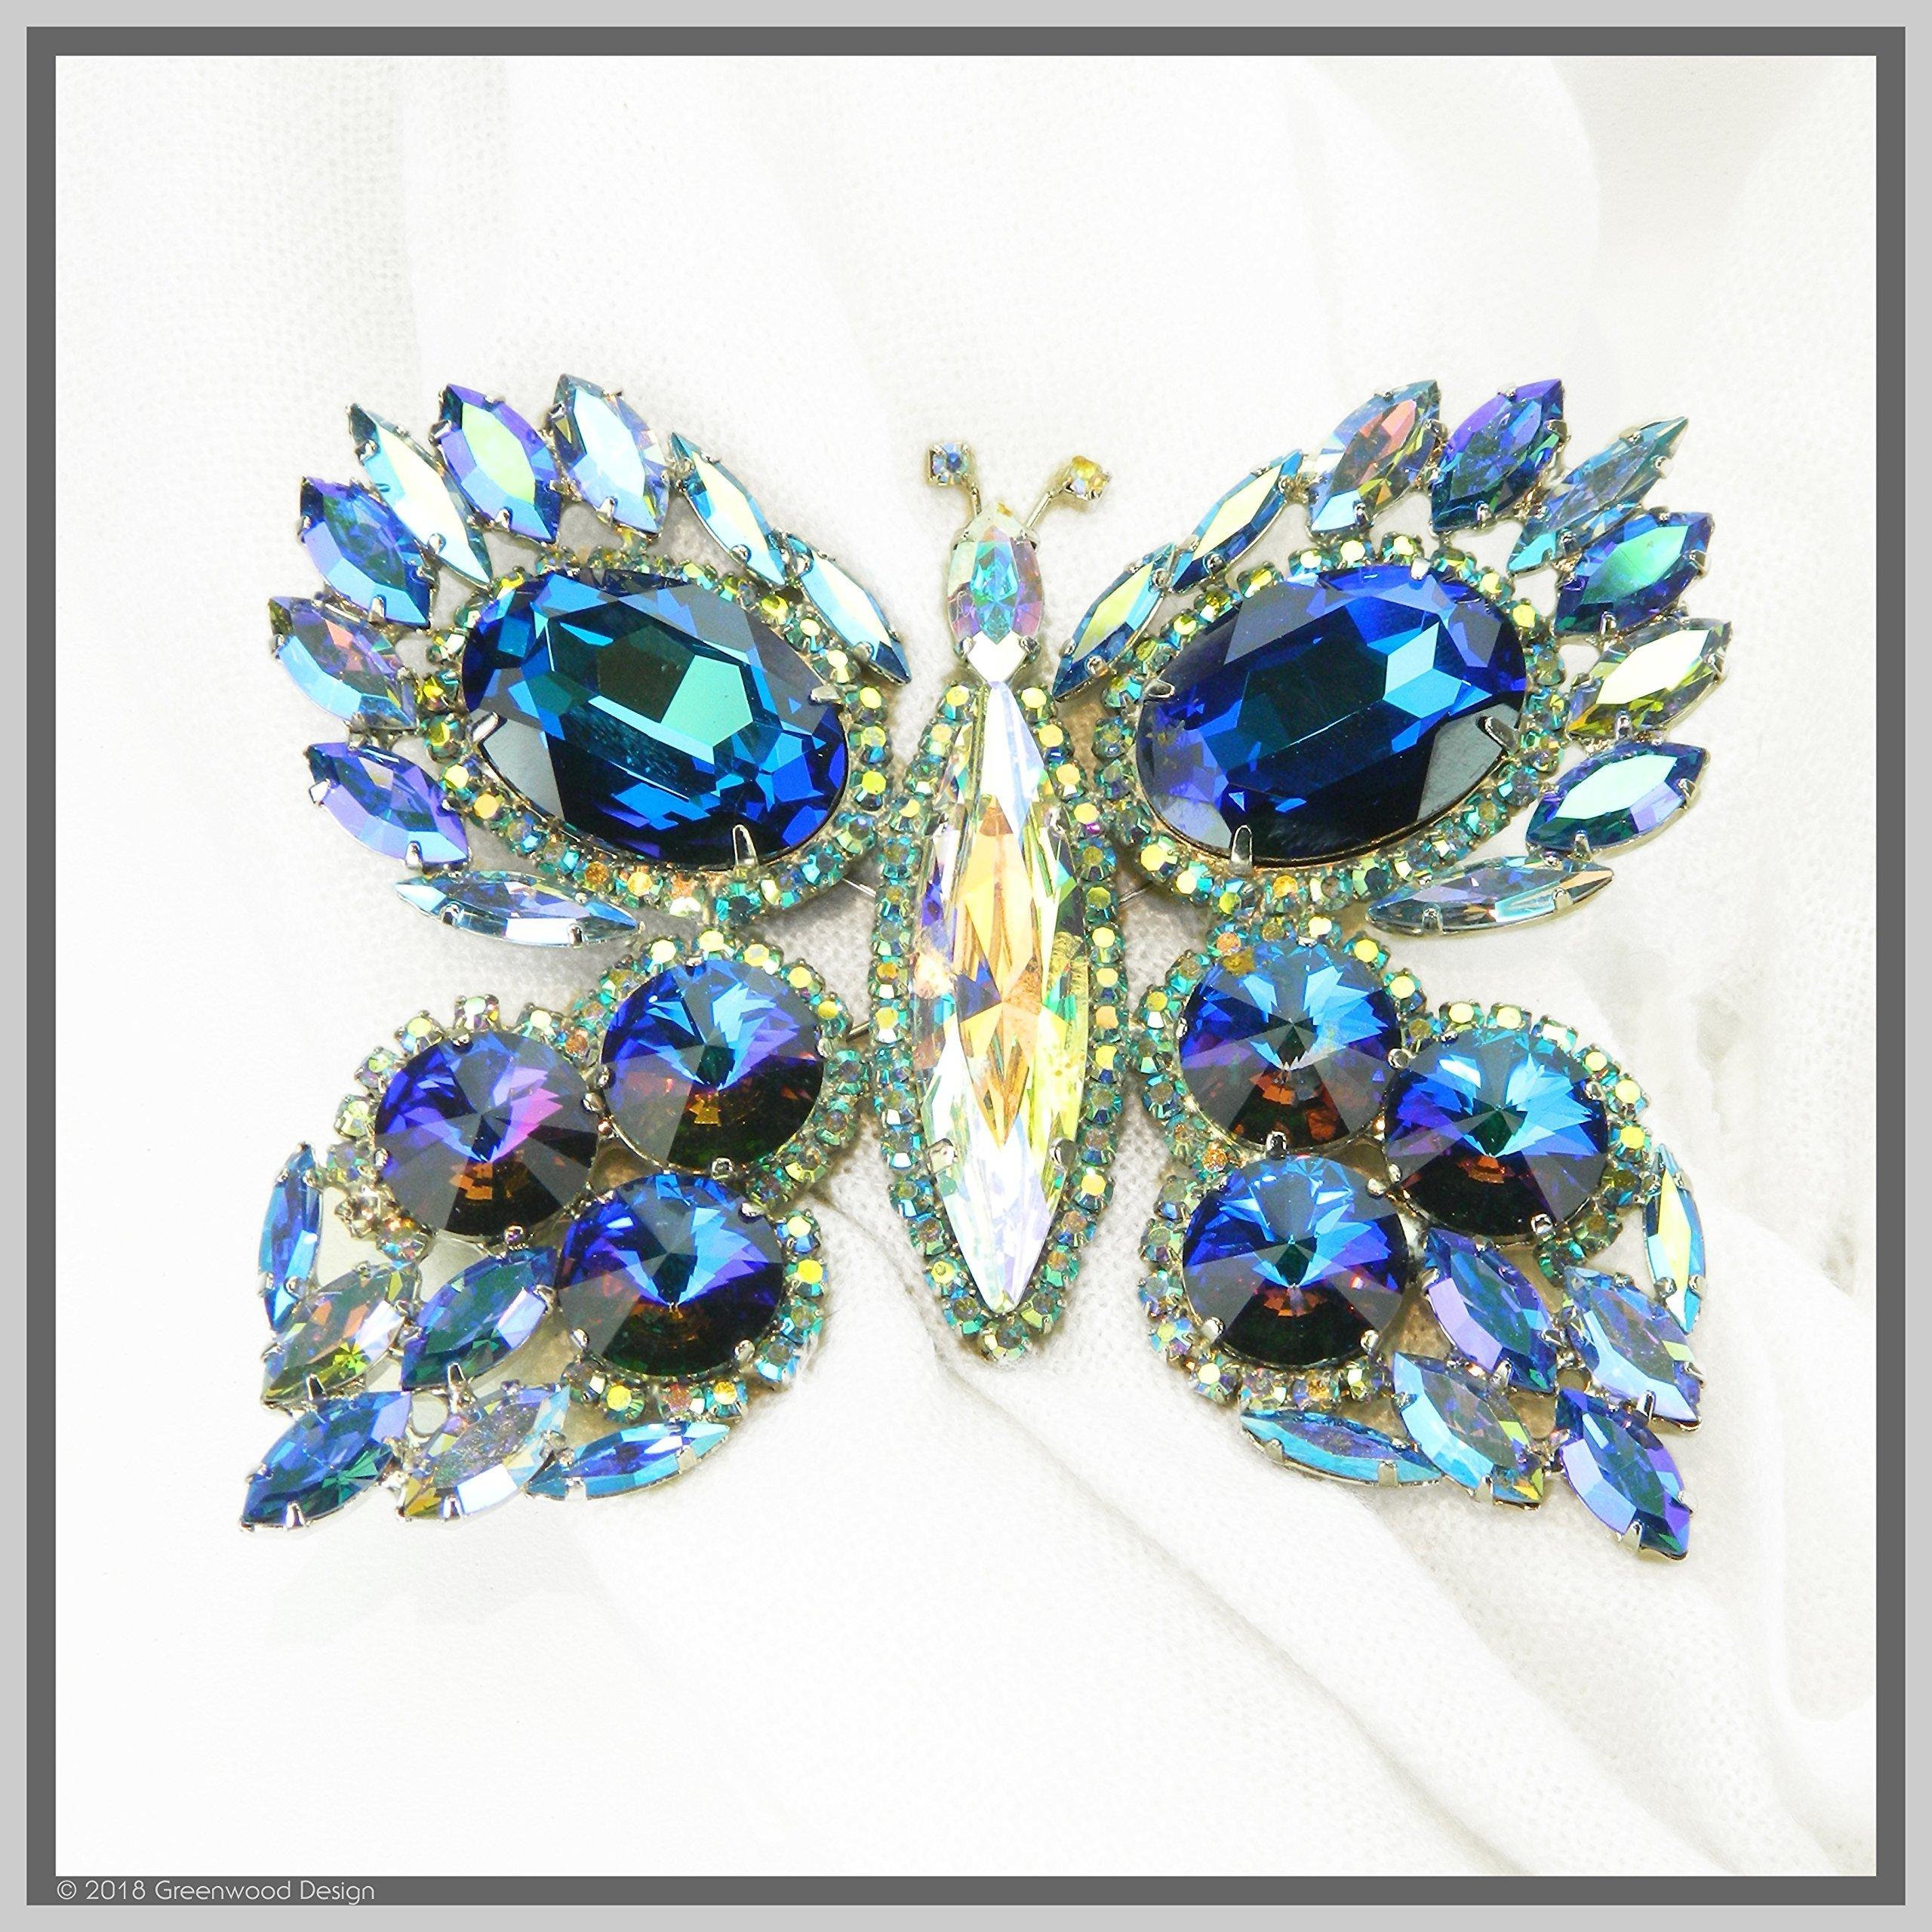 Hand Made Jewelry Art Butterfly Brooch Pin Exotic Blue Winged Swarovski Crystal Rhinestones